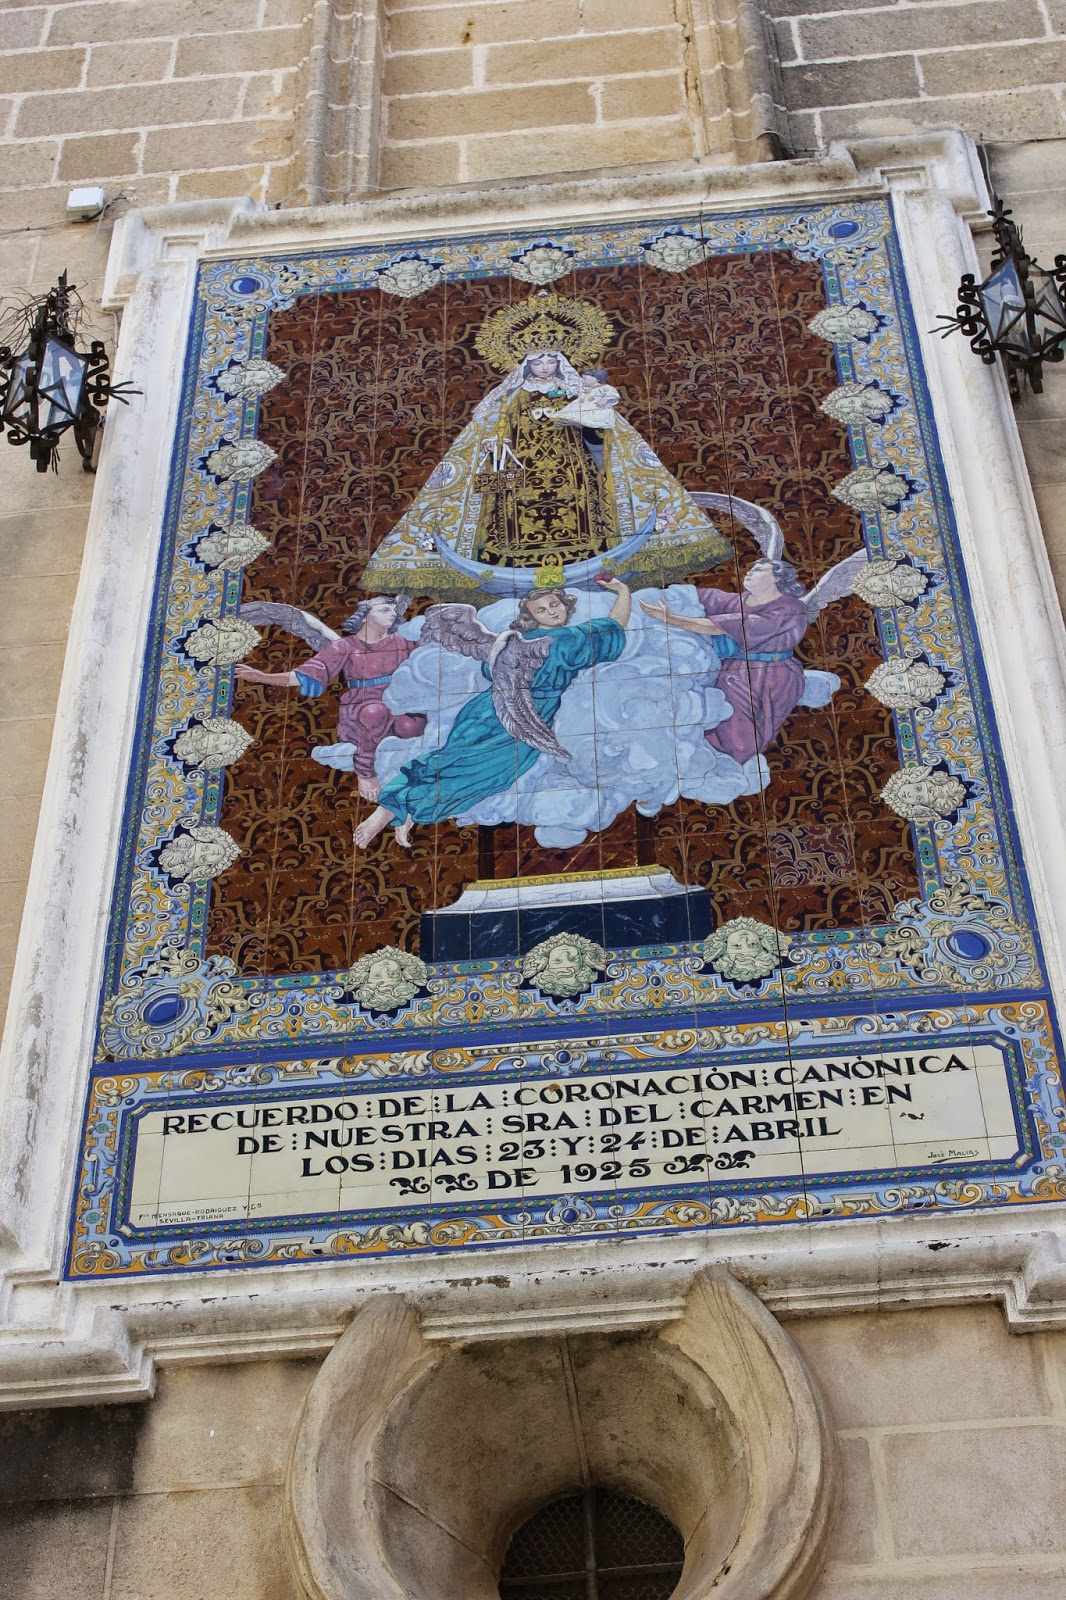 Maravillas ocultas de espa a ciudades gaditanas iii for Azulejos cadiz